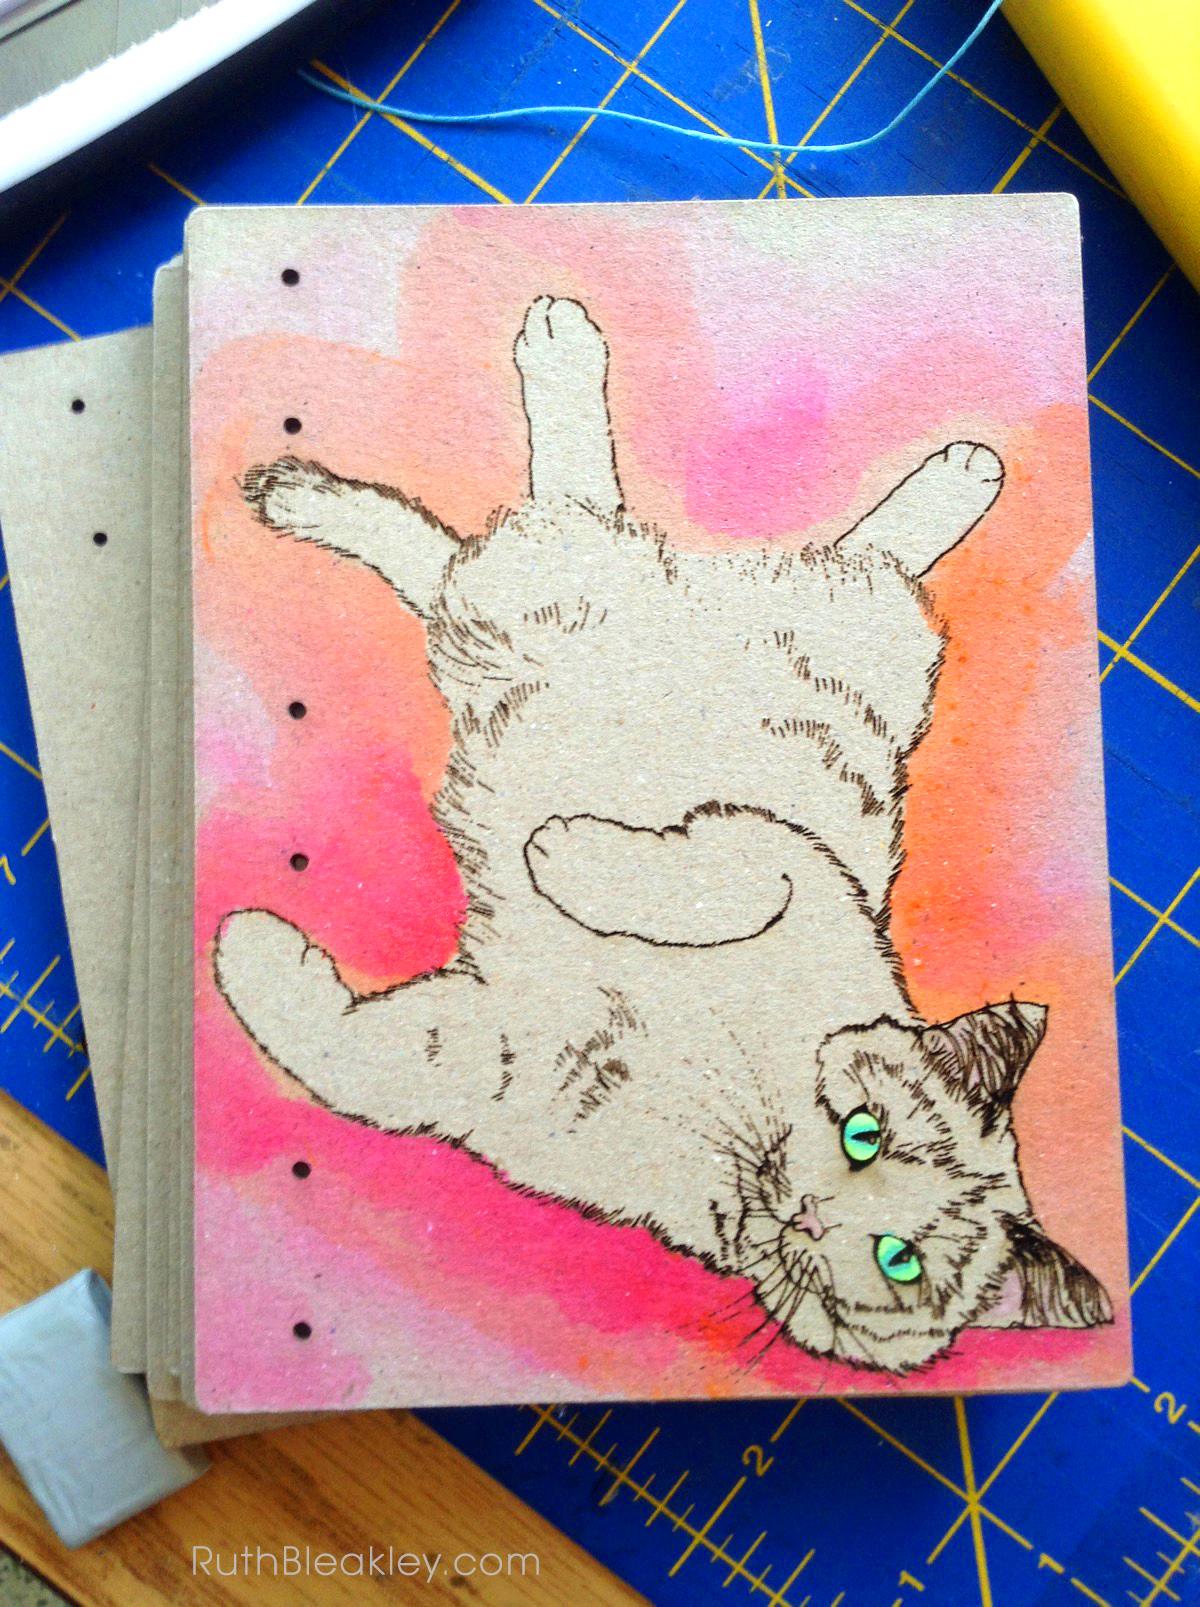 Orange and Pink Cat Journal progress photos handmade by book artist Ruth Bleakley - 1